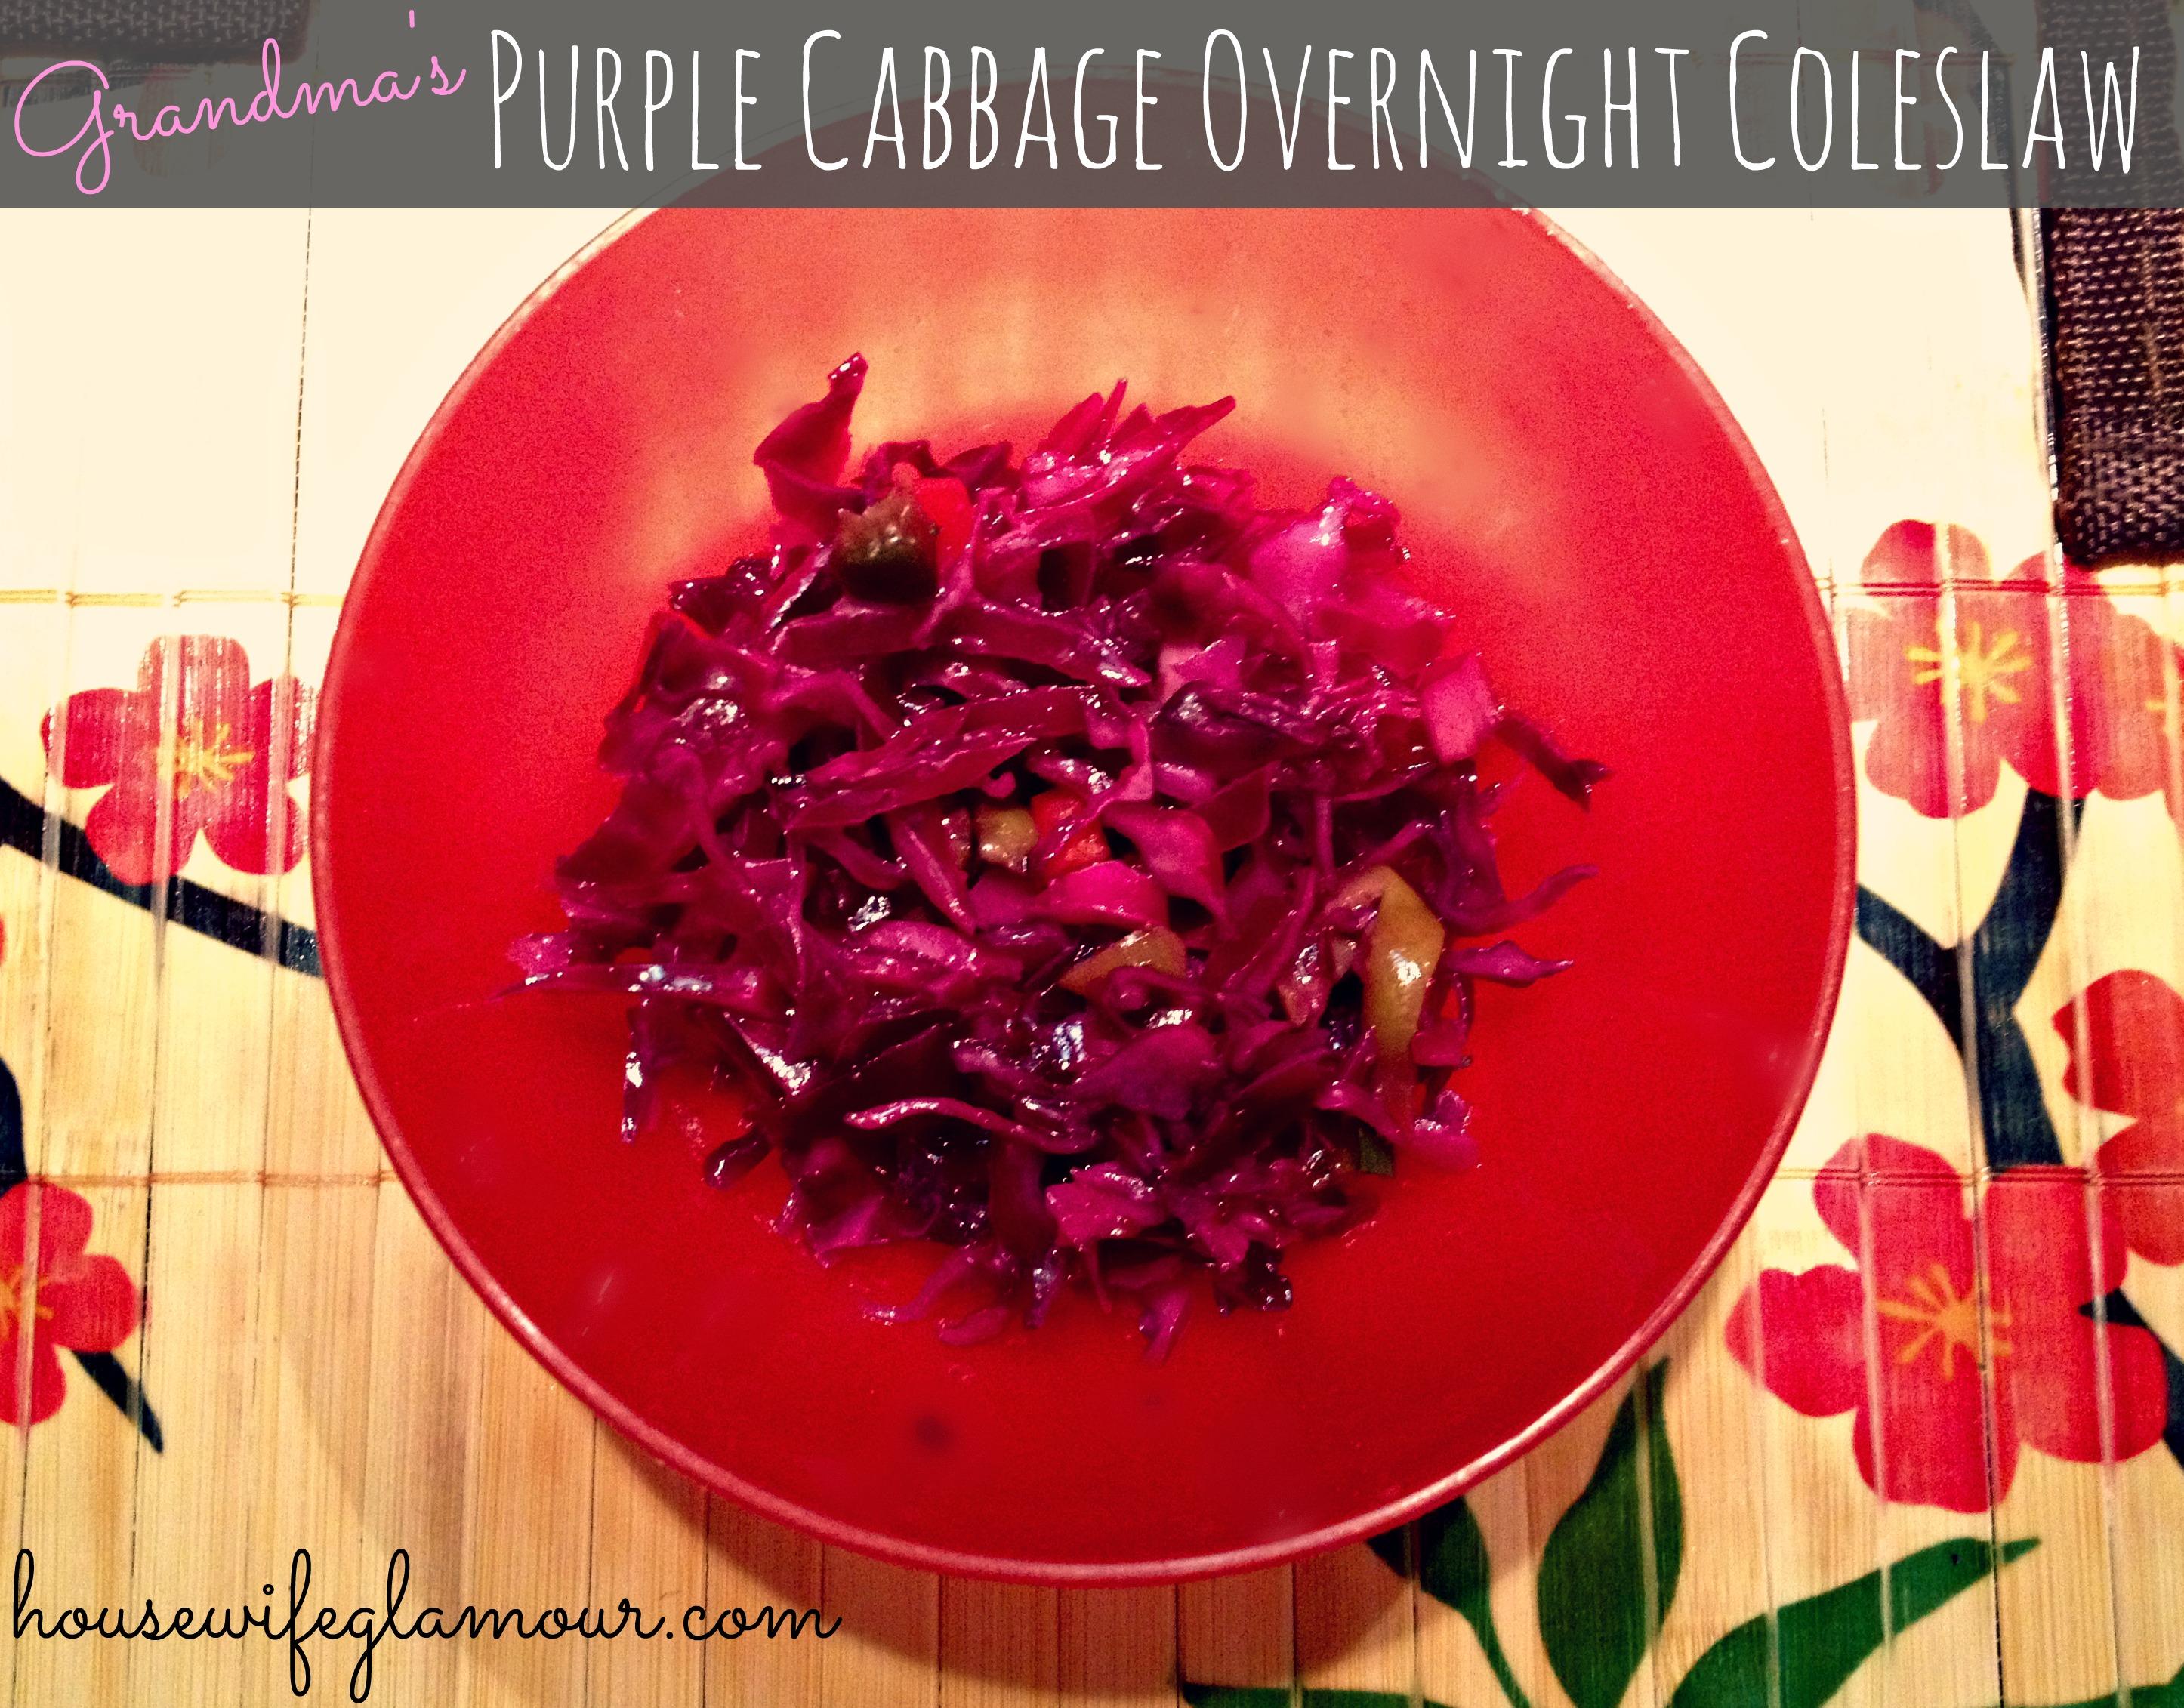 Grandma's Purple Cabbage Overnight Coleslaw